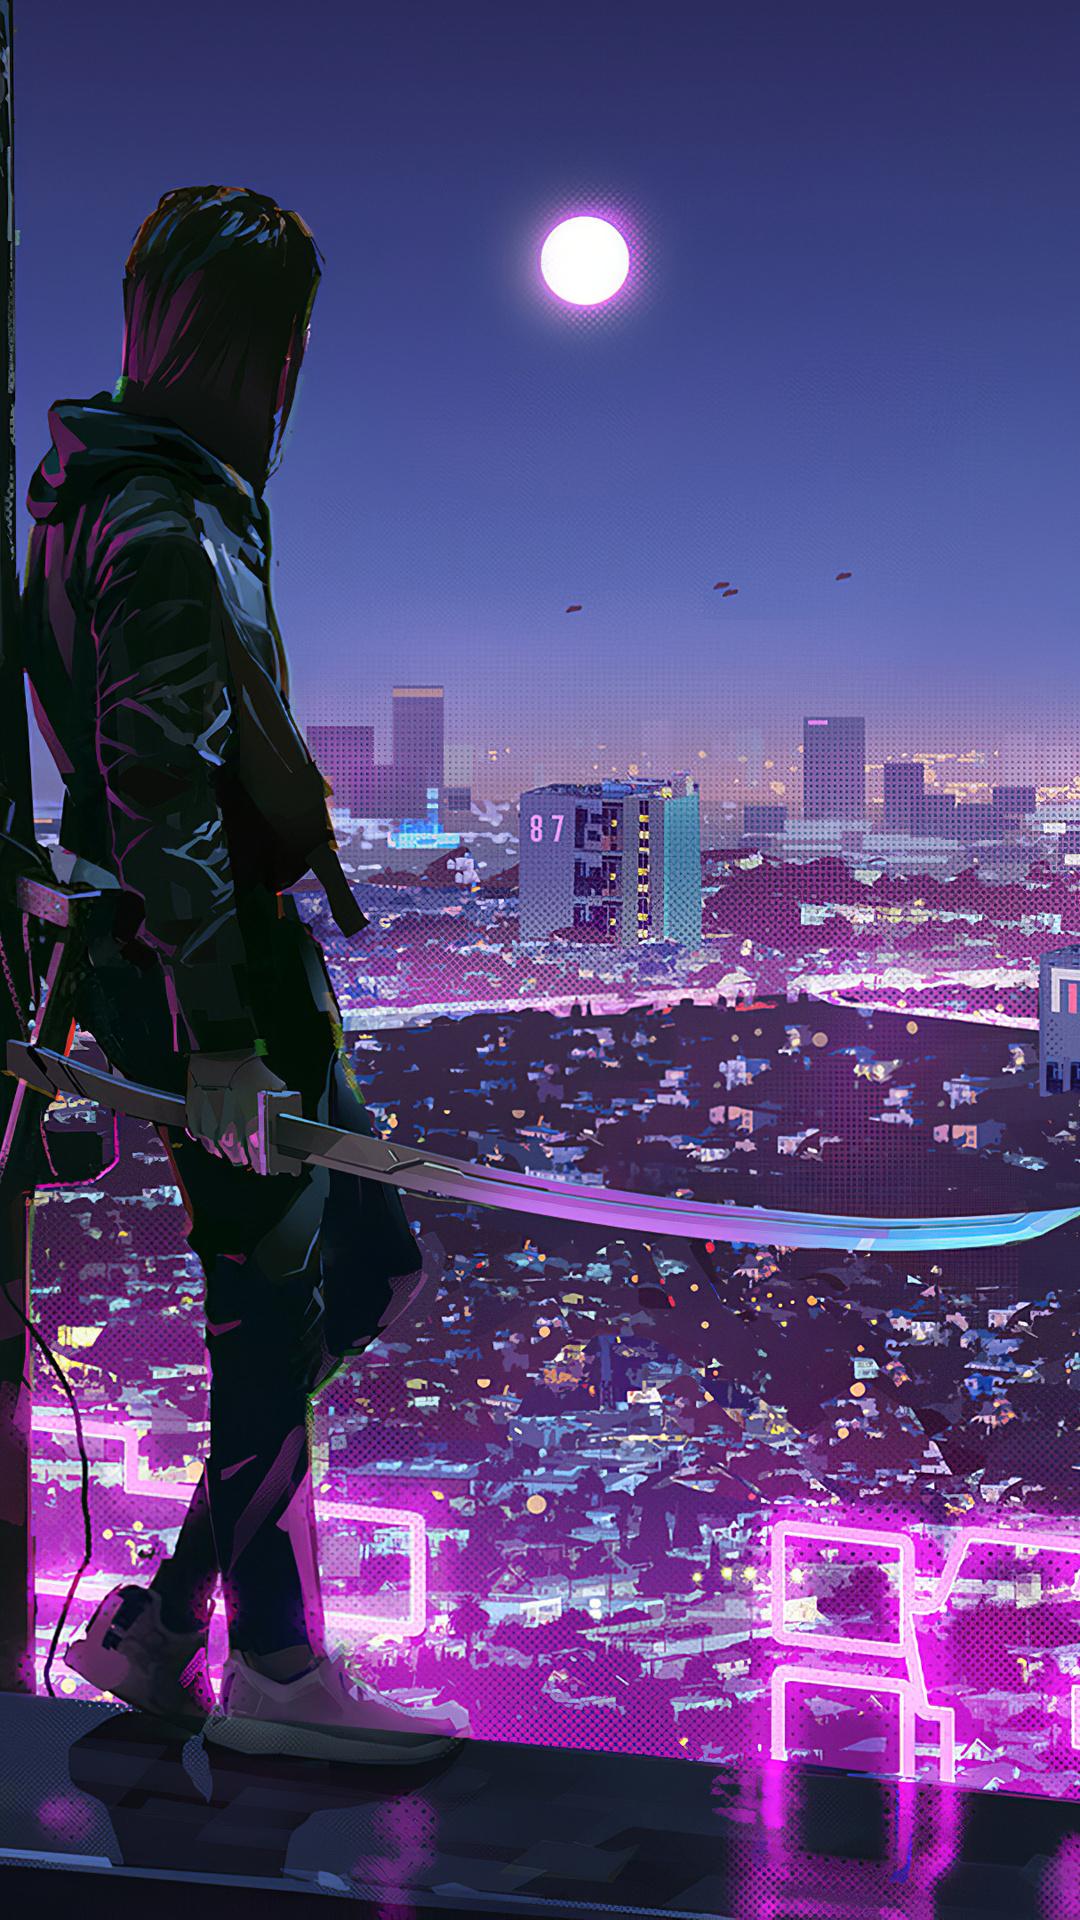 1080x1920 Neon Lights Cyber Ninja Boy 4k Iphone 7,6s,6 ...